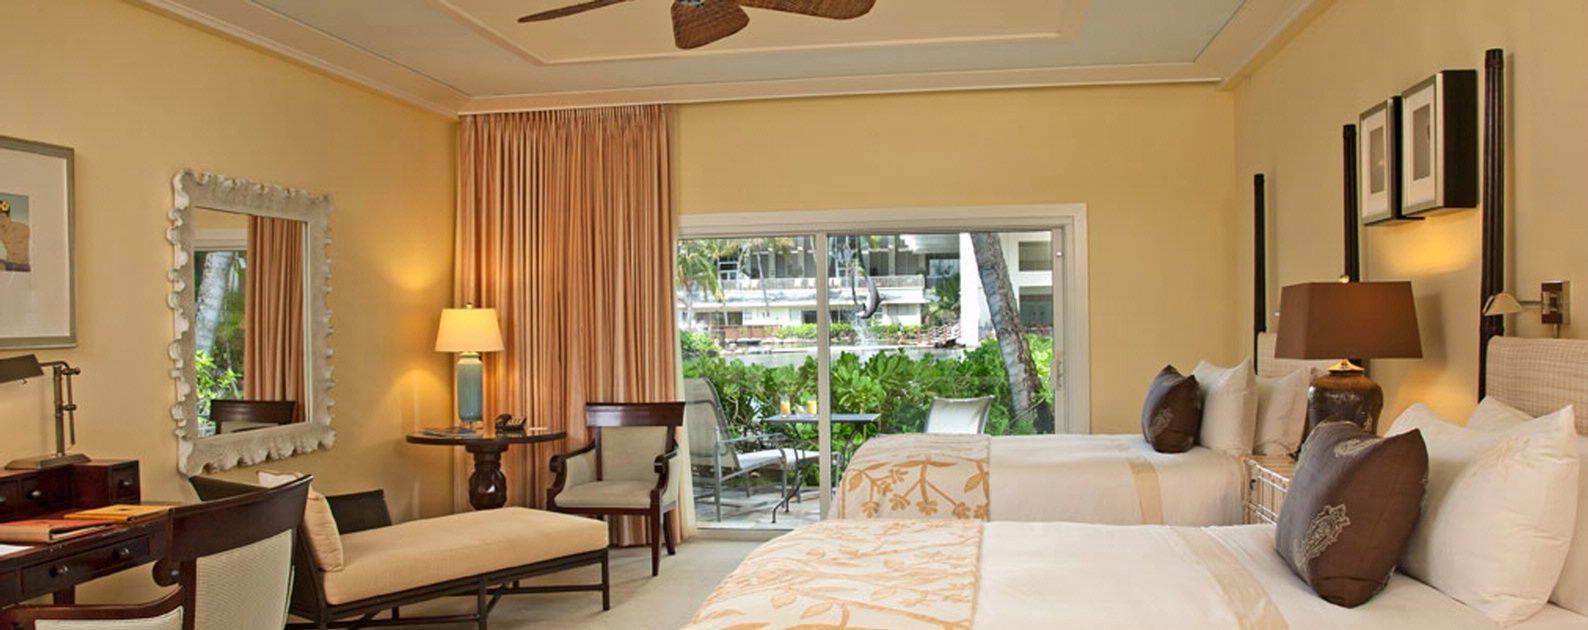 The Kahala Hotel Resort Lanai Room Lanai Honolulu Hotels